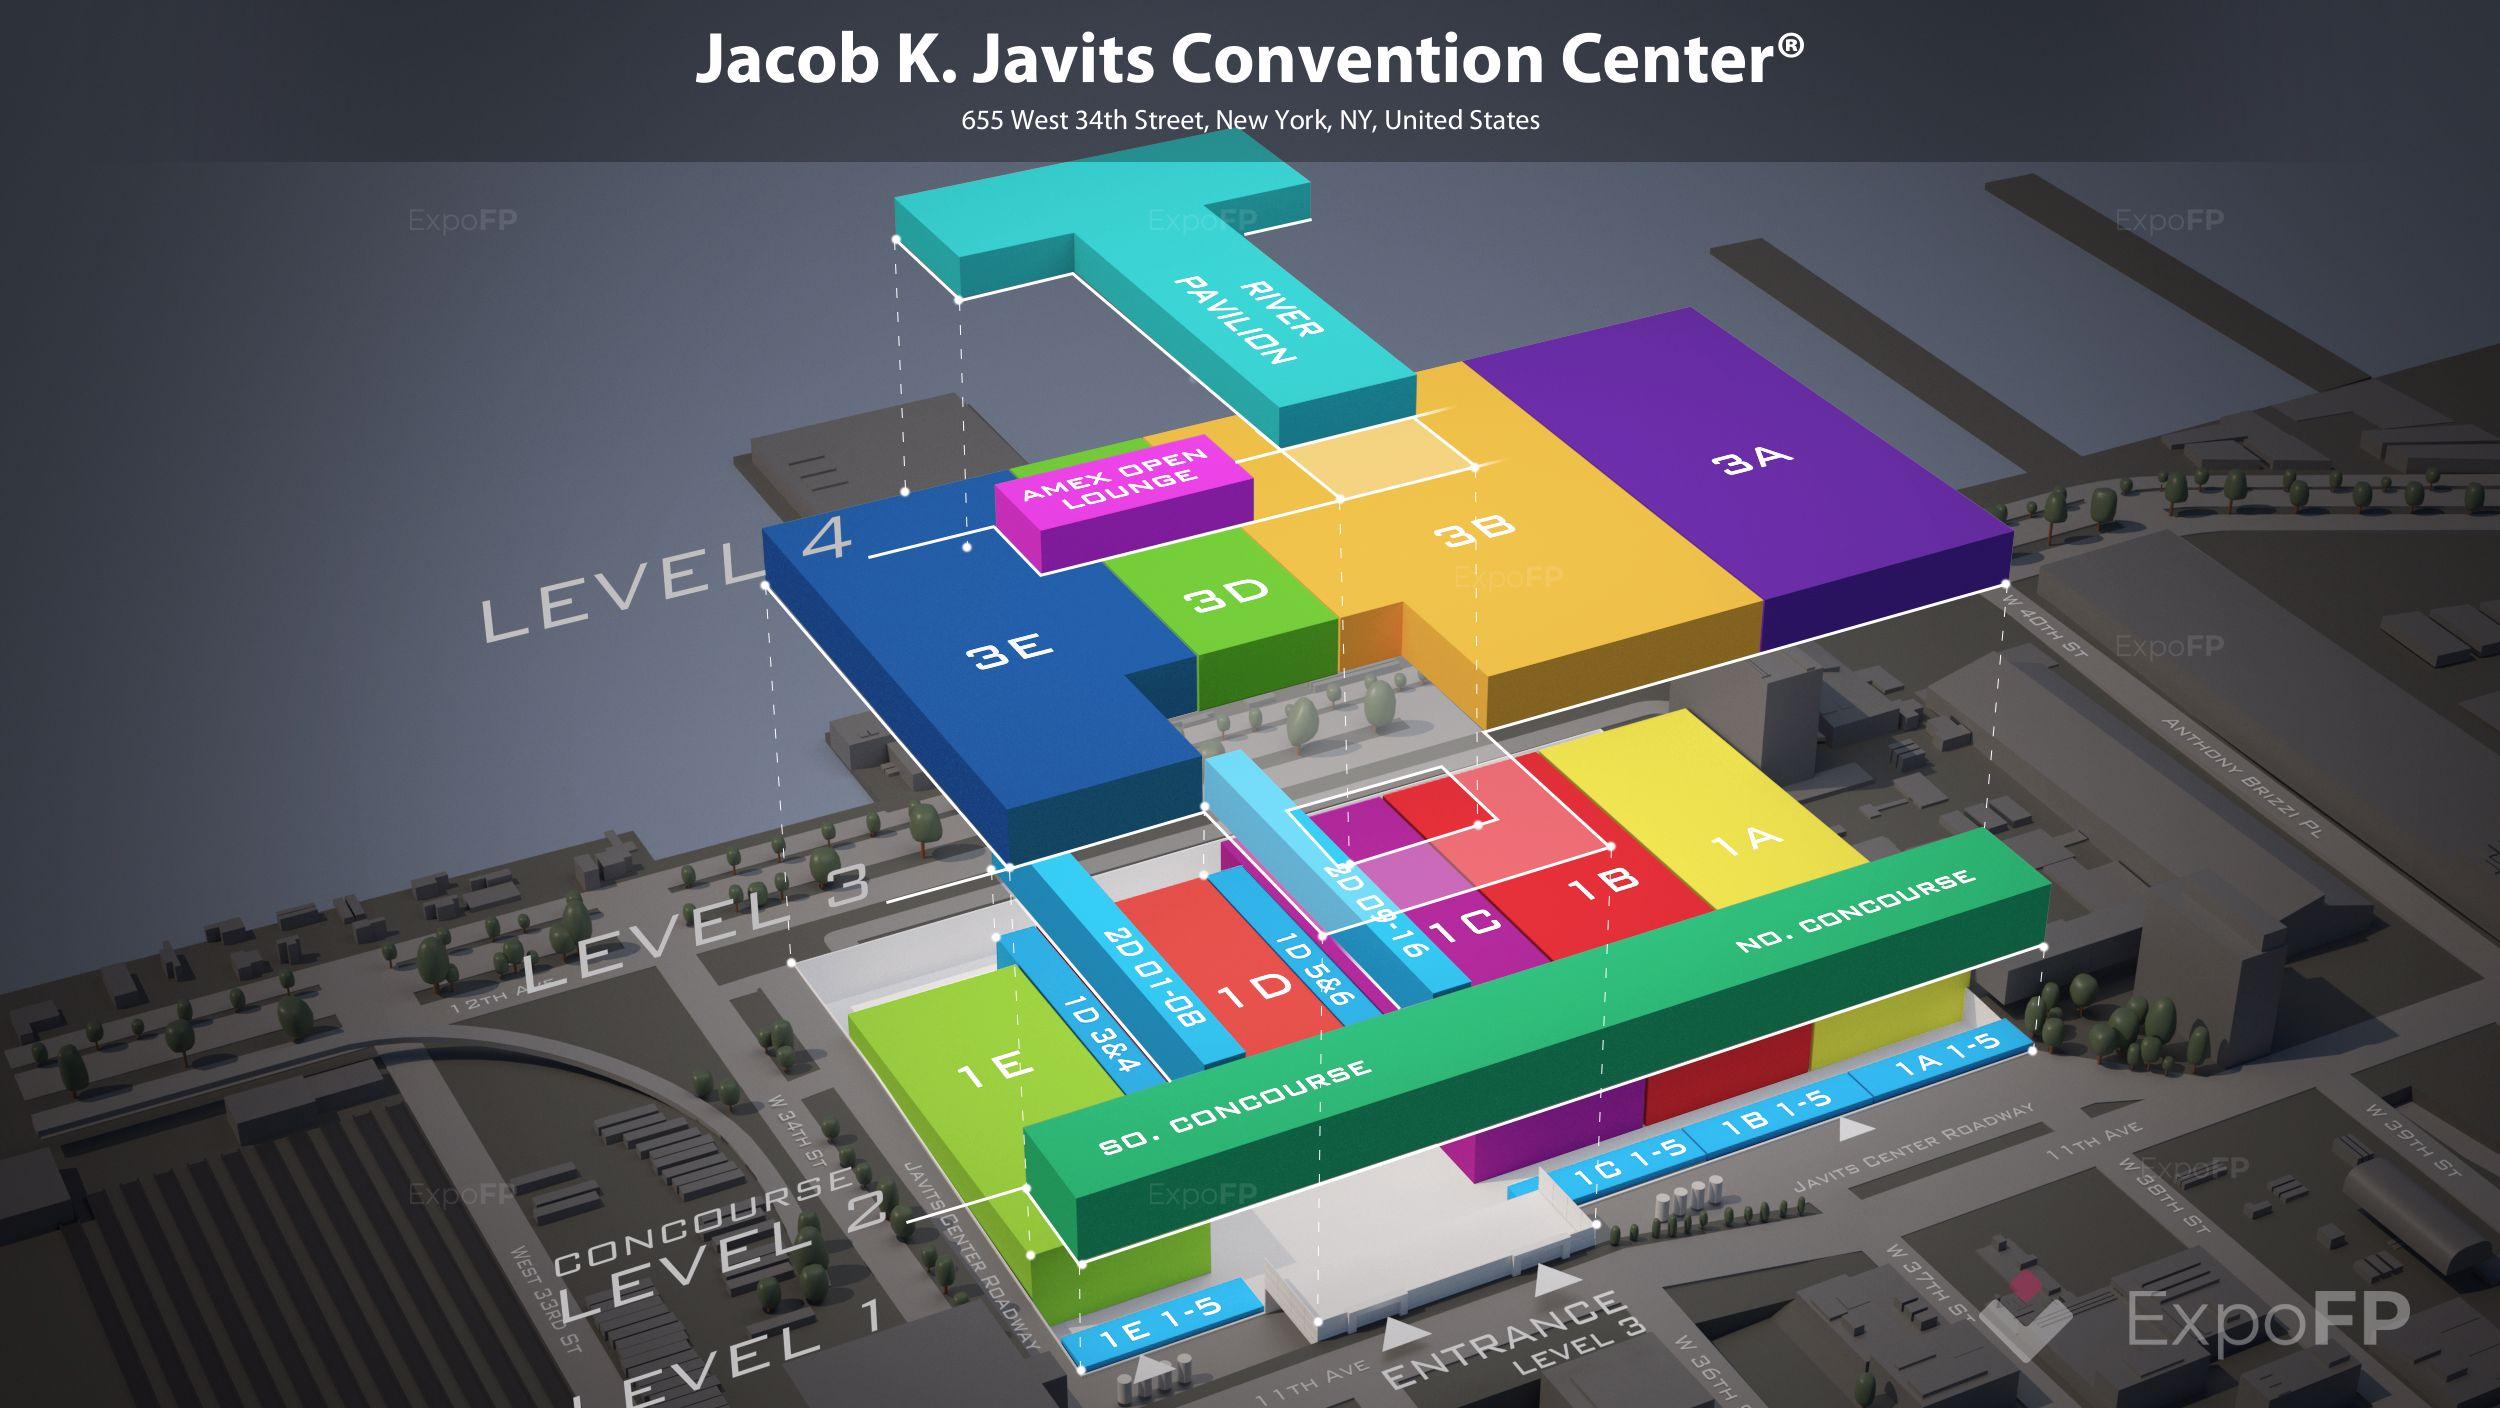 Javits Center Calendar 2019 Jacob K. Javits Convention Center floor plan